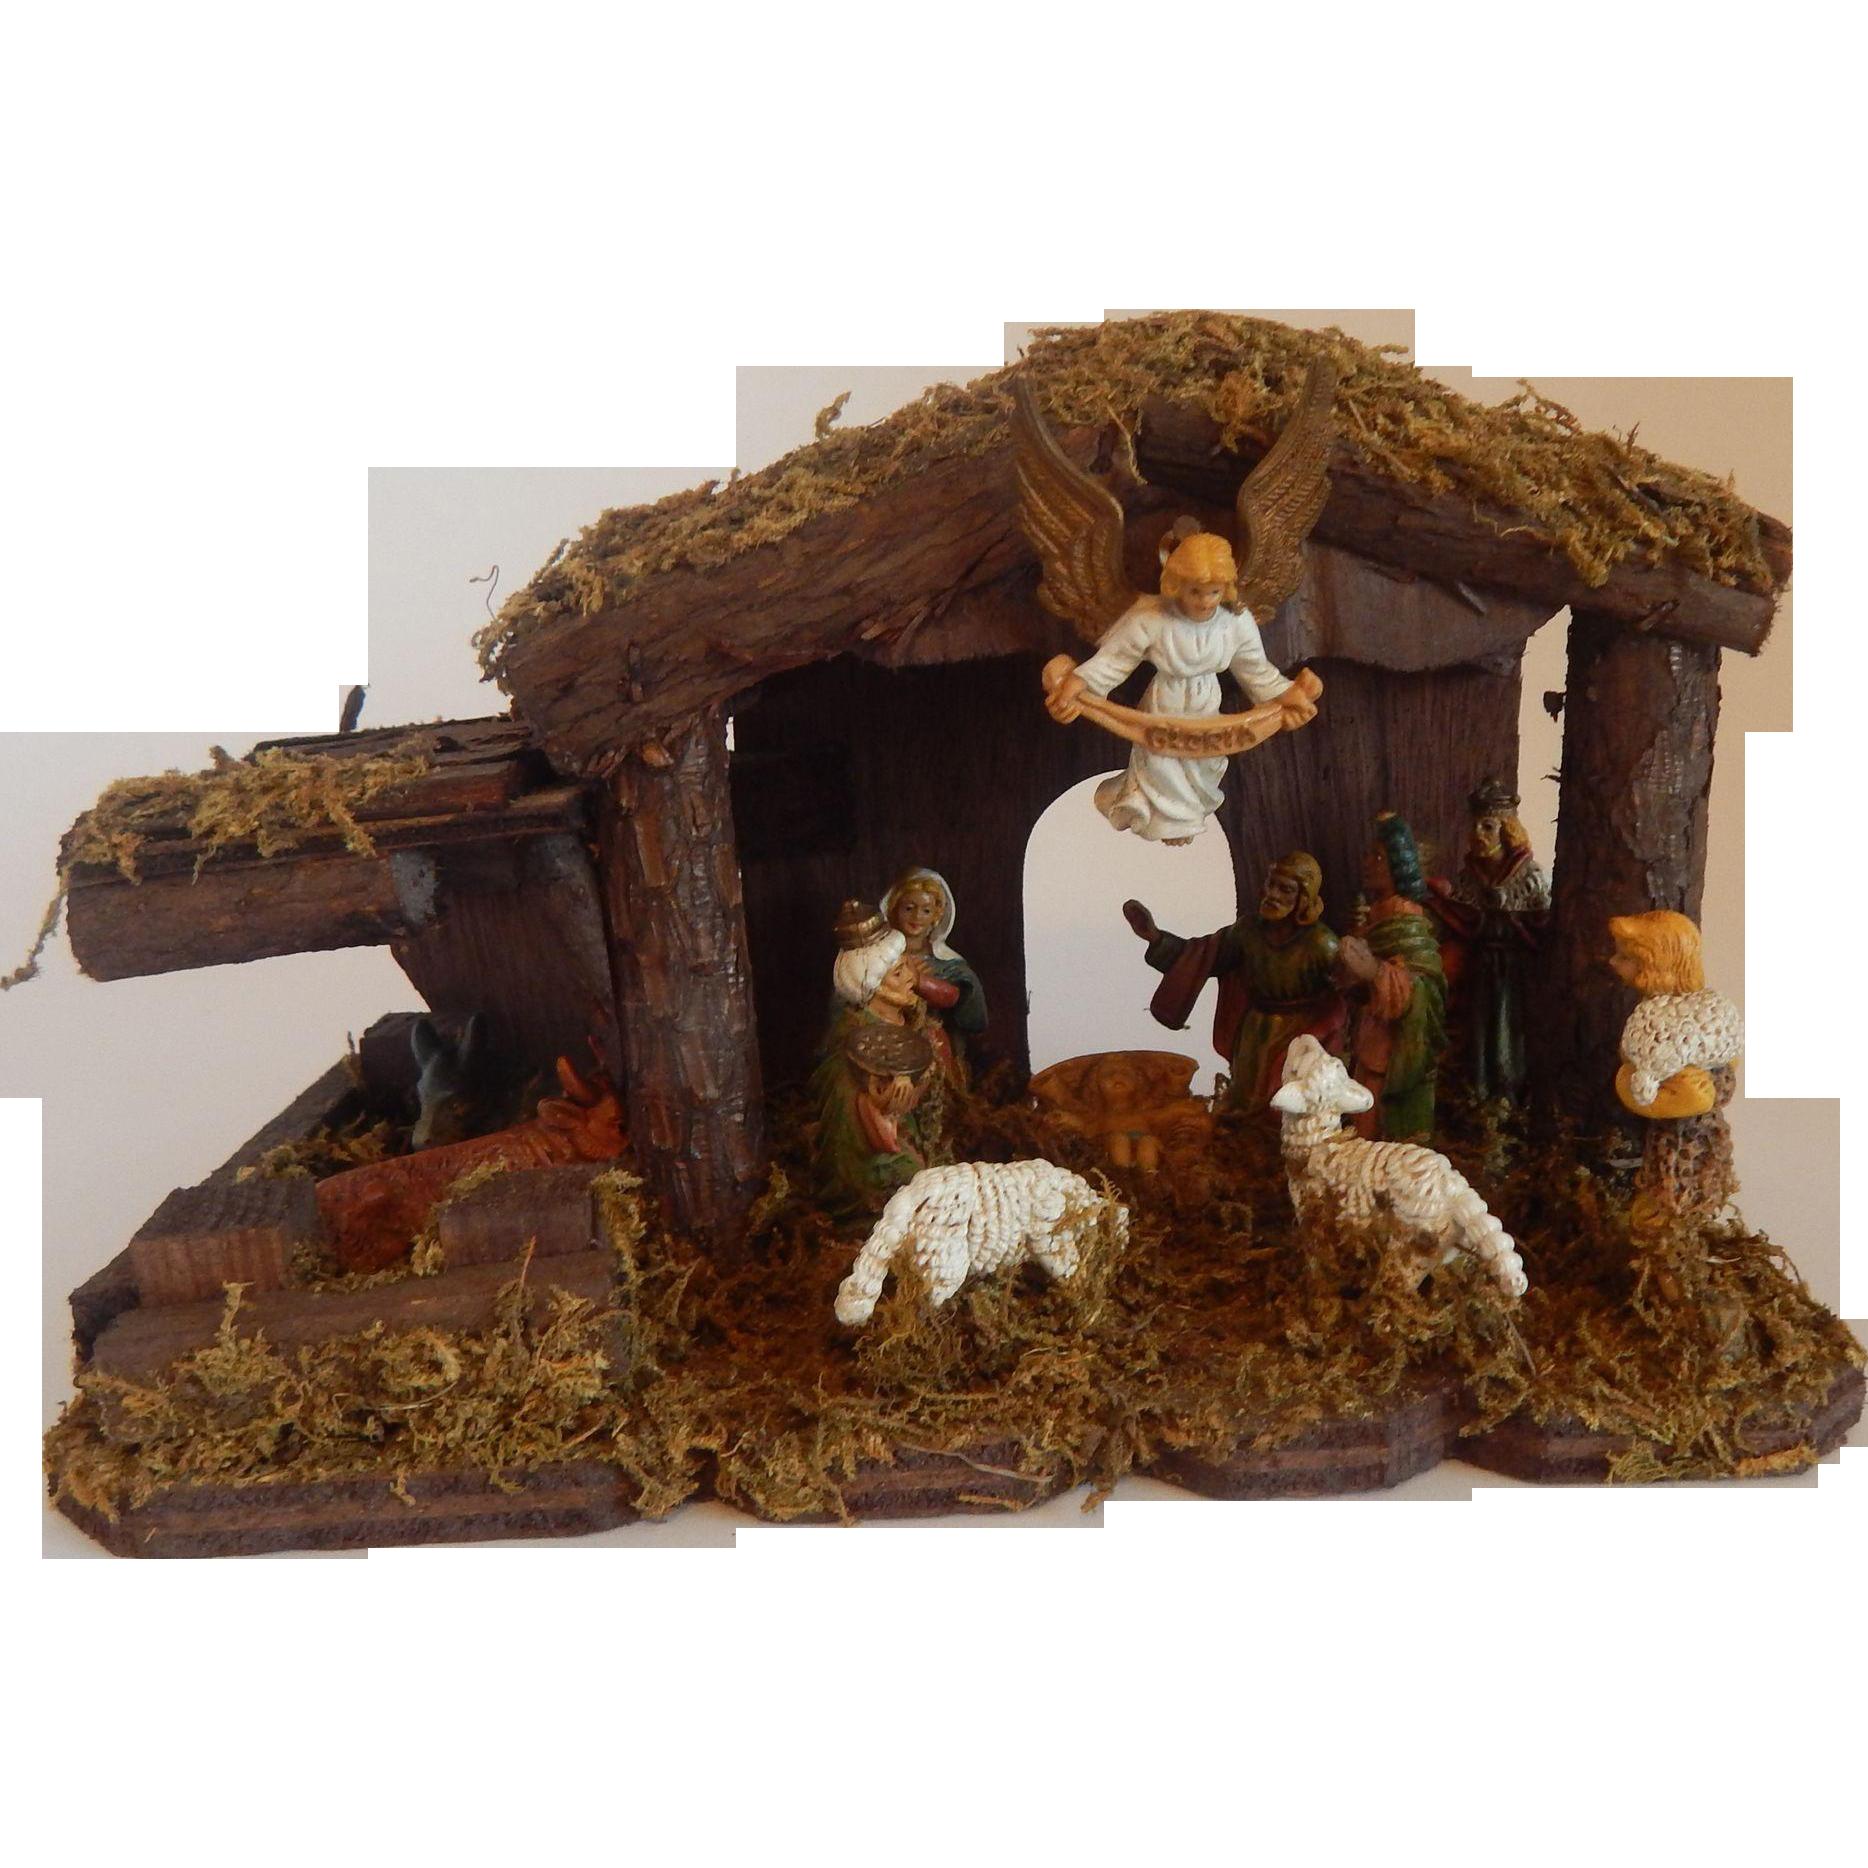 Kurt S. Adler Nativity Creche Scene